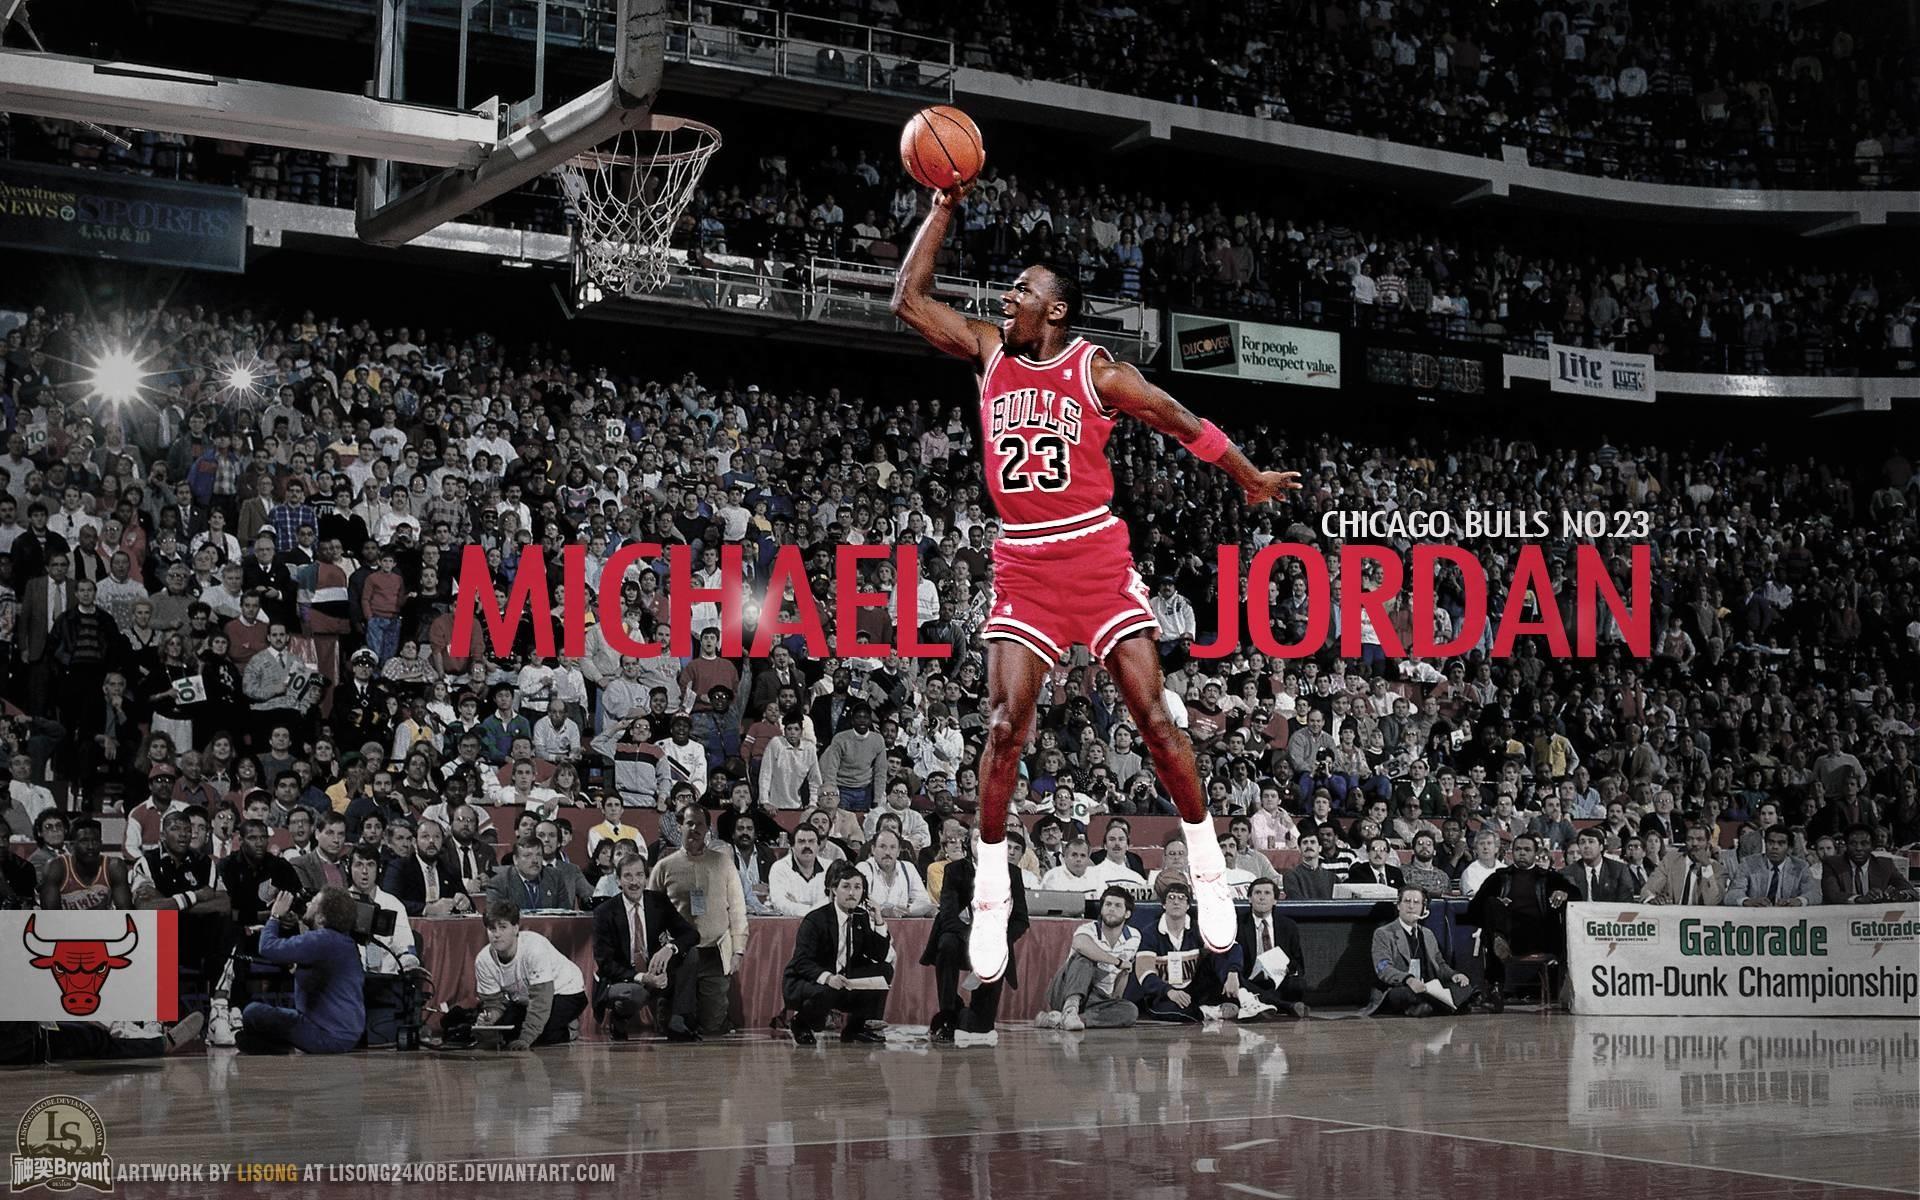 1920x1200 Michael Jordan Dunks From The Free Throw Line